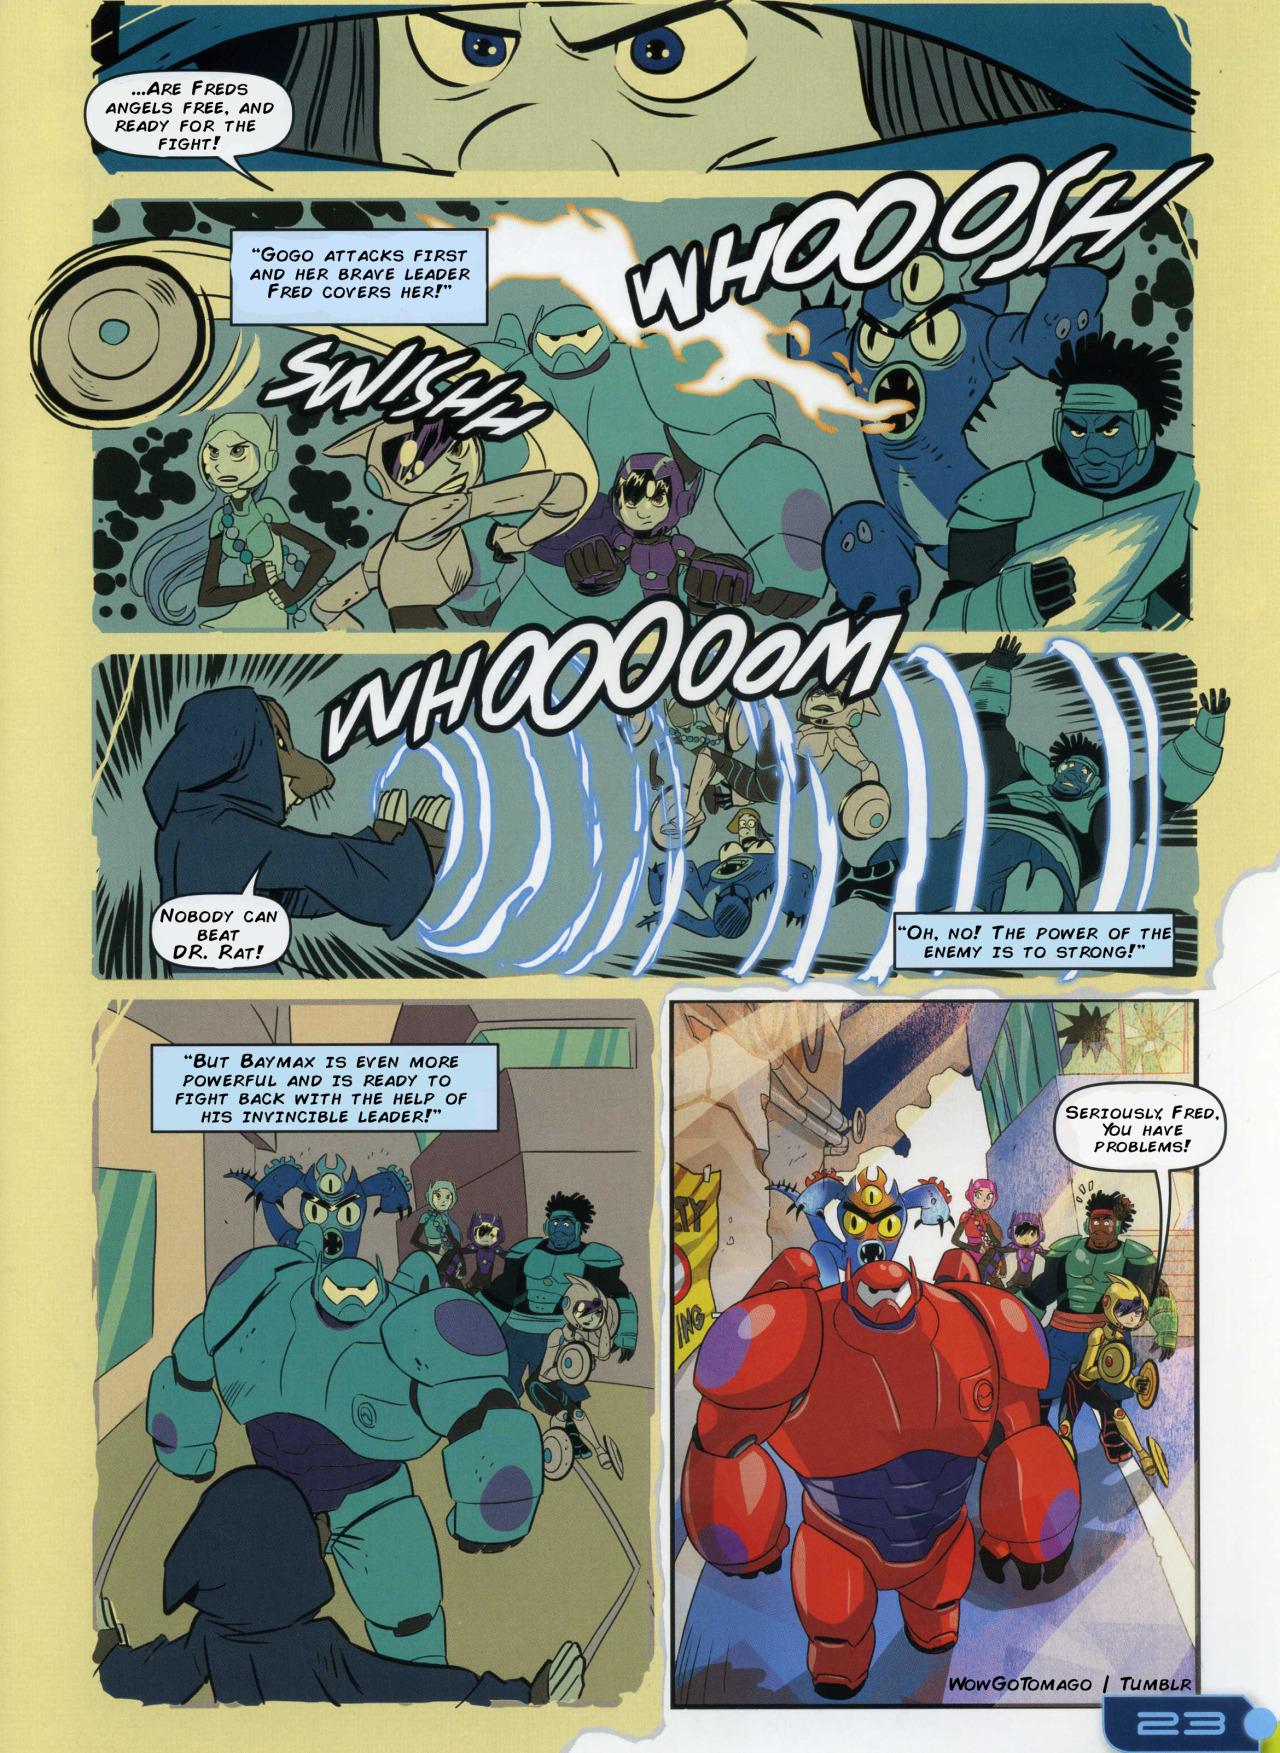 Big Hero Comic big hero 6 comic - adventurous imagination - operação big